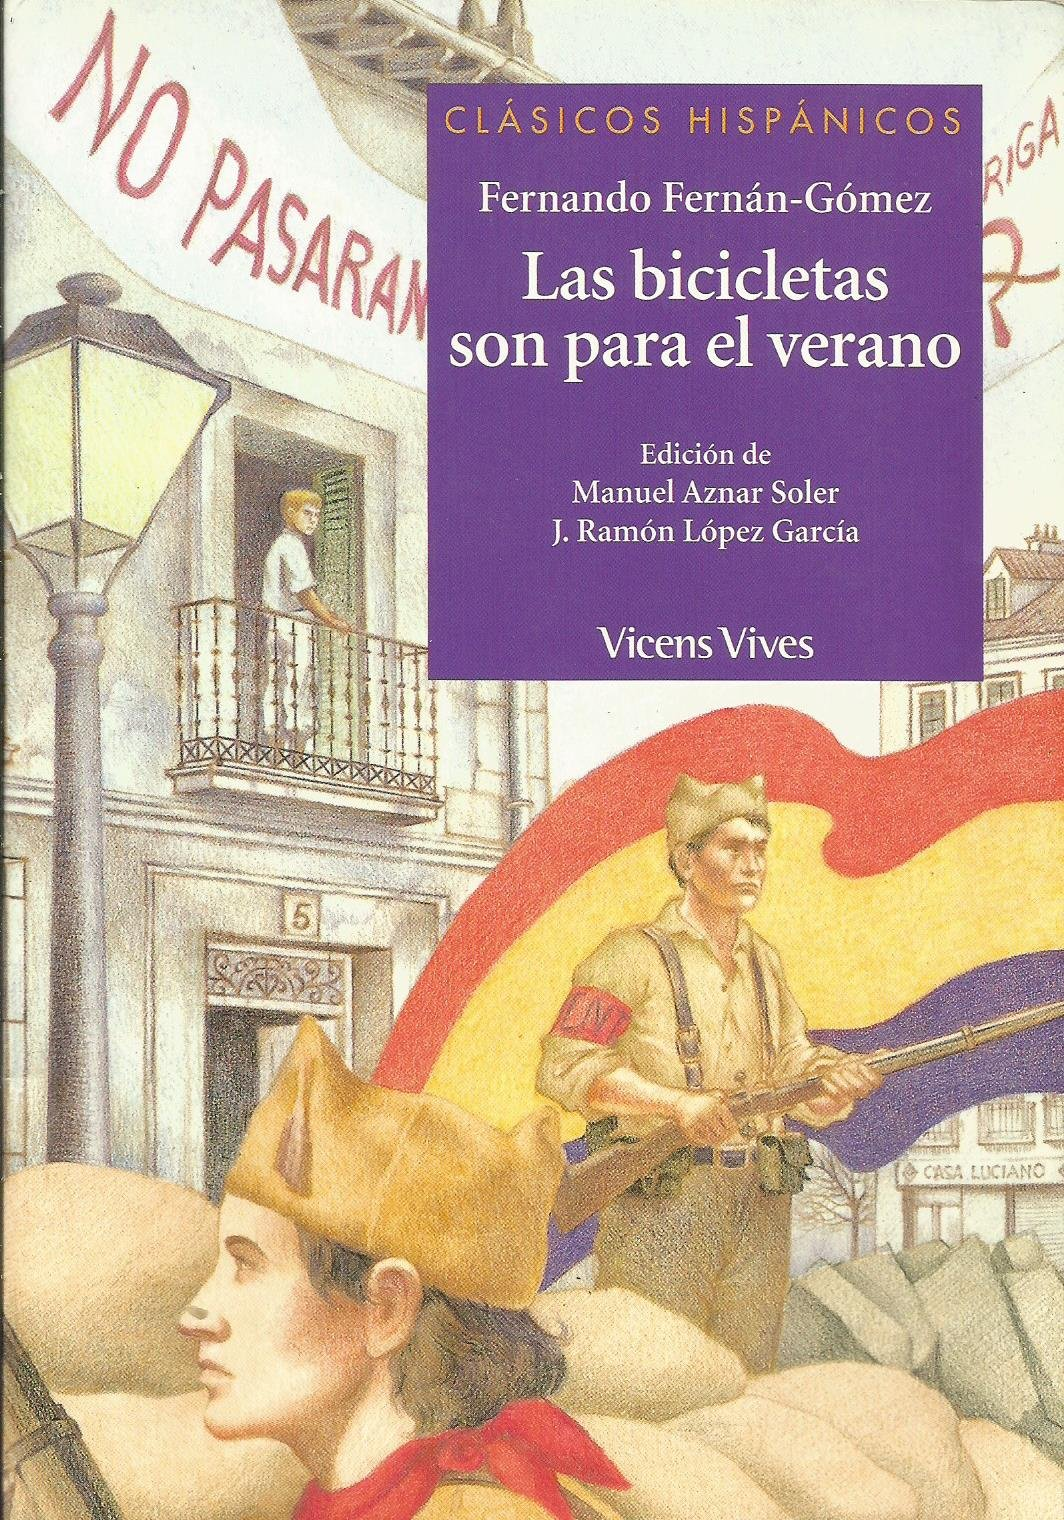 Las bicicletas son para el verano / Bicycles are for the Summer (Clasicos Hispanicos / Hispanic Classics) (Spanish Edition) pdf